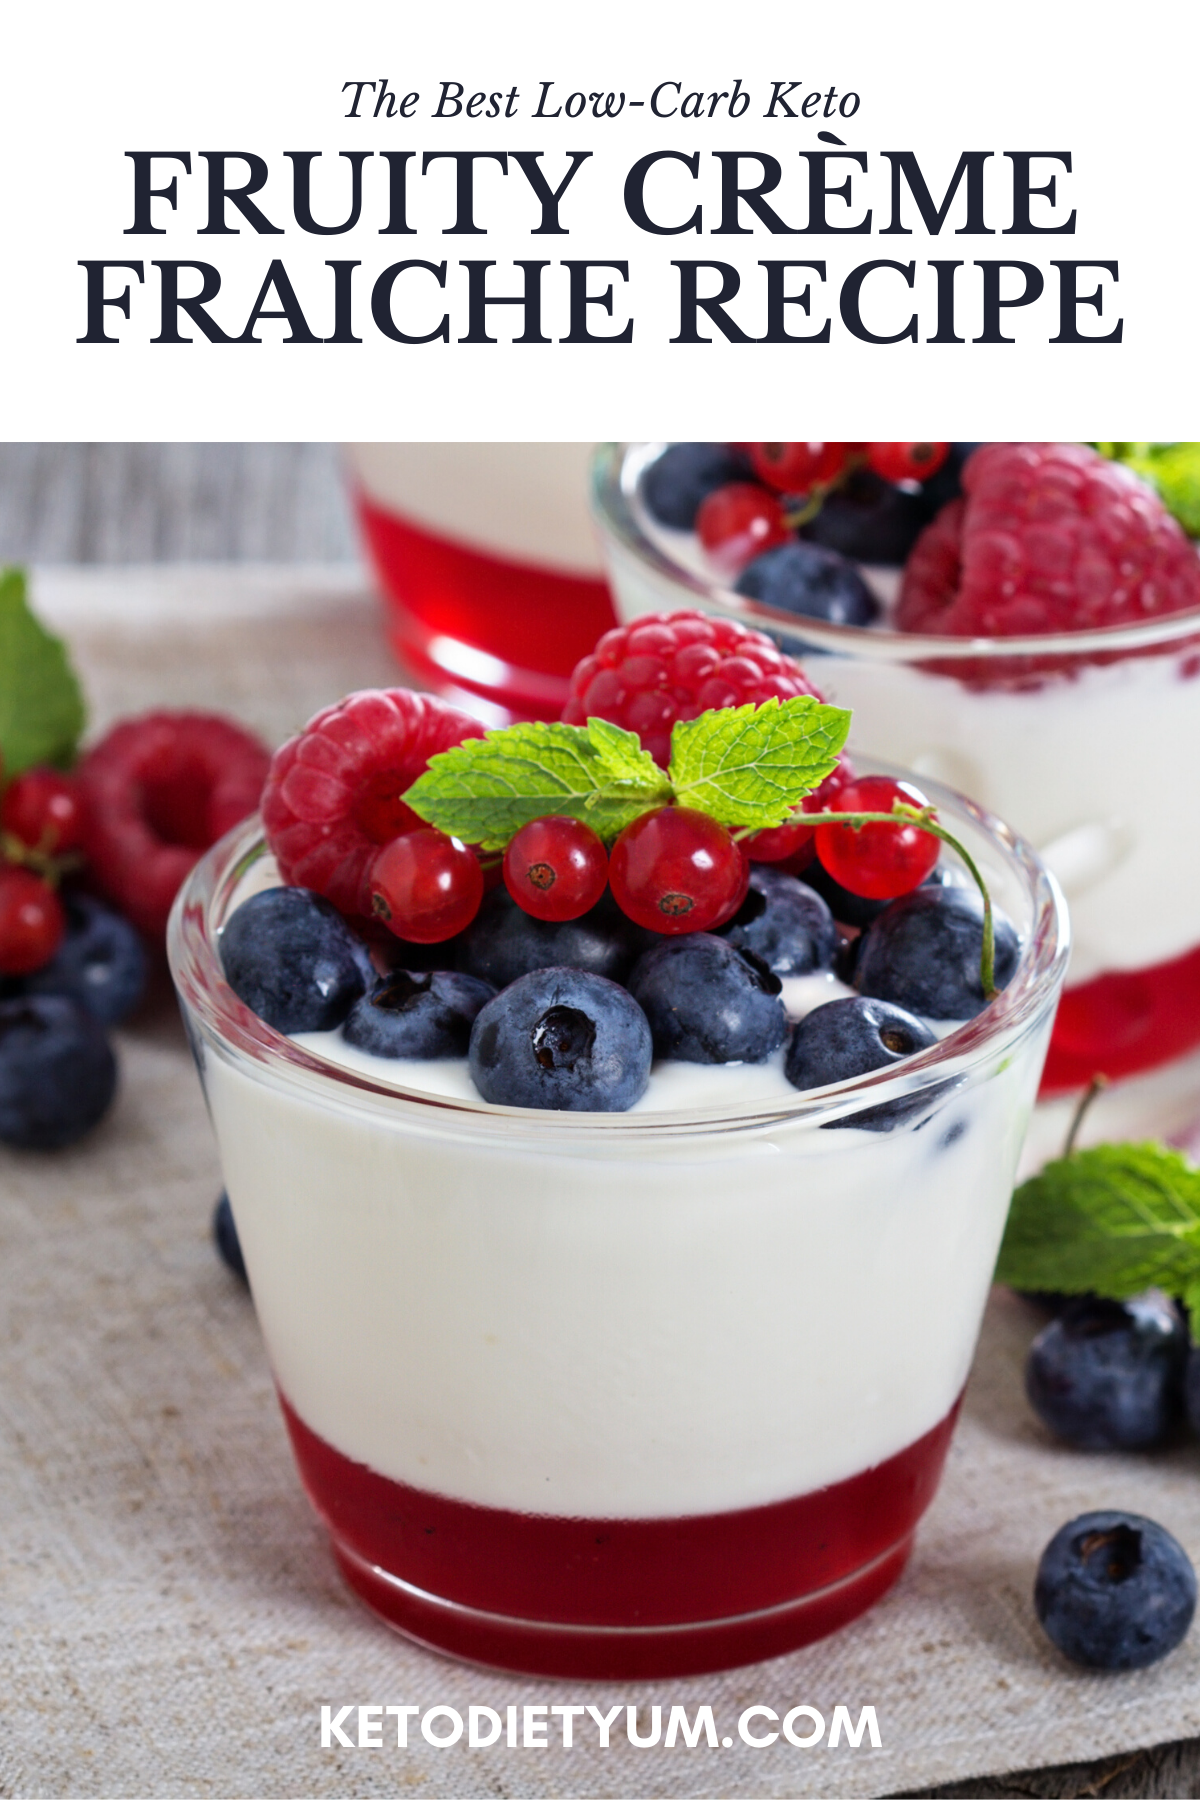 Keto Fruity Creme Fraiche Recipe In 2020 Parfait Breakfast Creme Fraiche Recipes Berry Breakfast